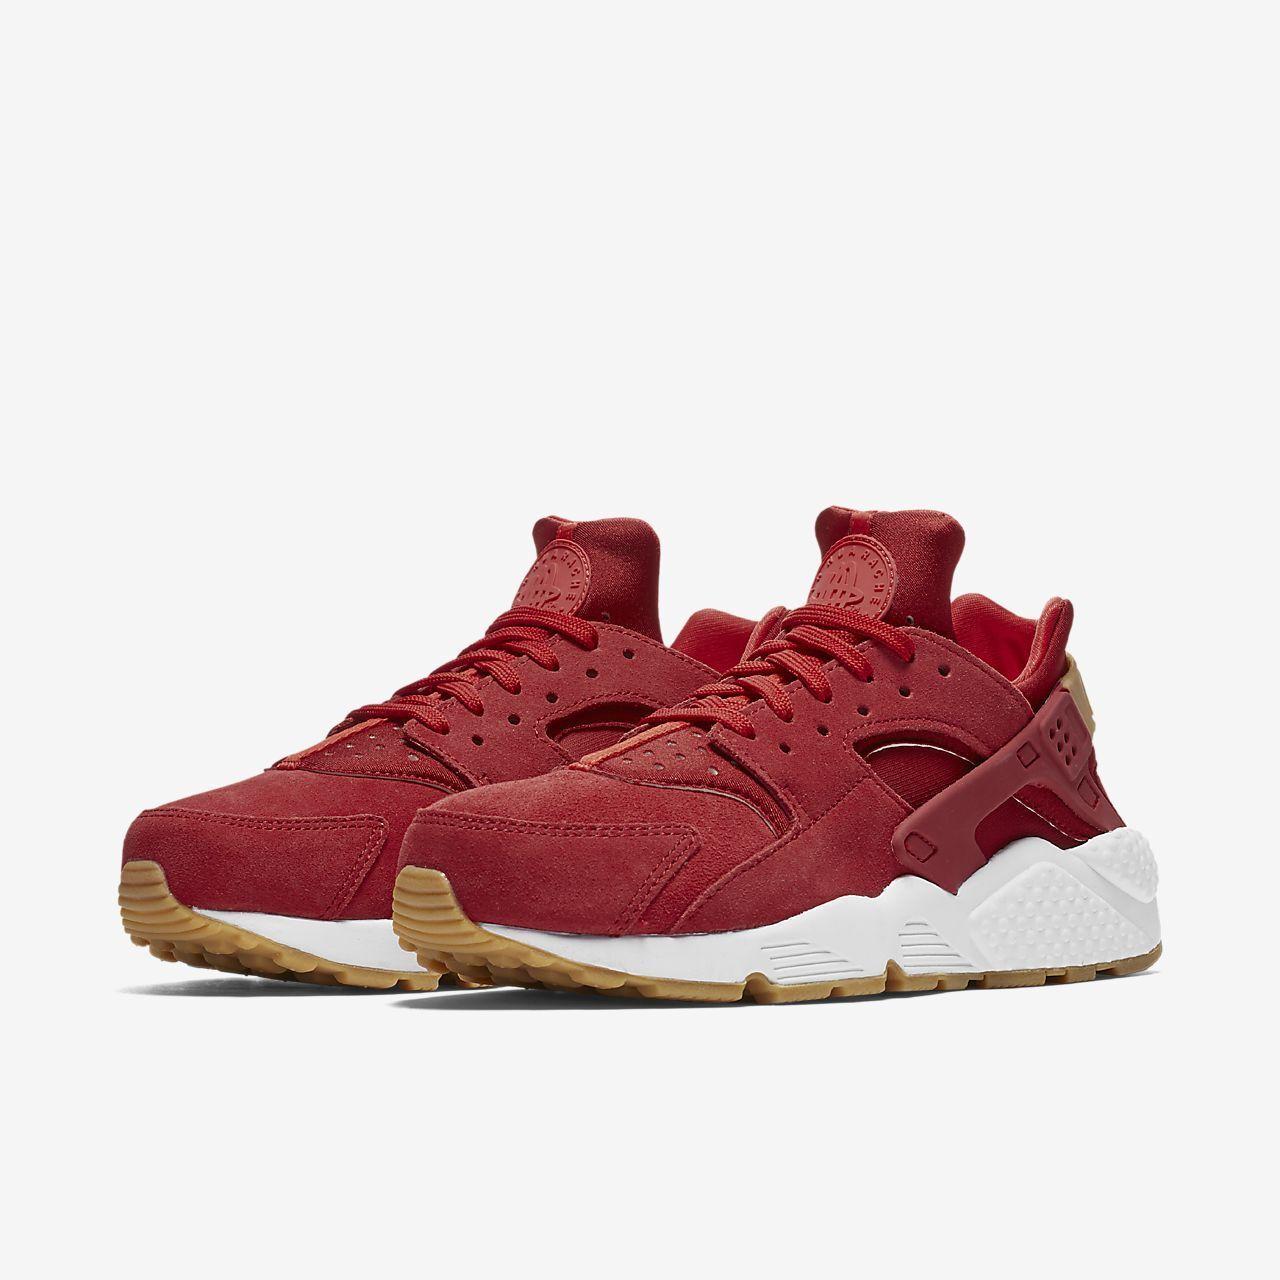 Wild casual shoes NIKE WOMENS AIR HUARACHE RUN AA0524-601 RED BURGUNDY WINE RUNNING GIRLS RETRO OG